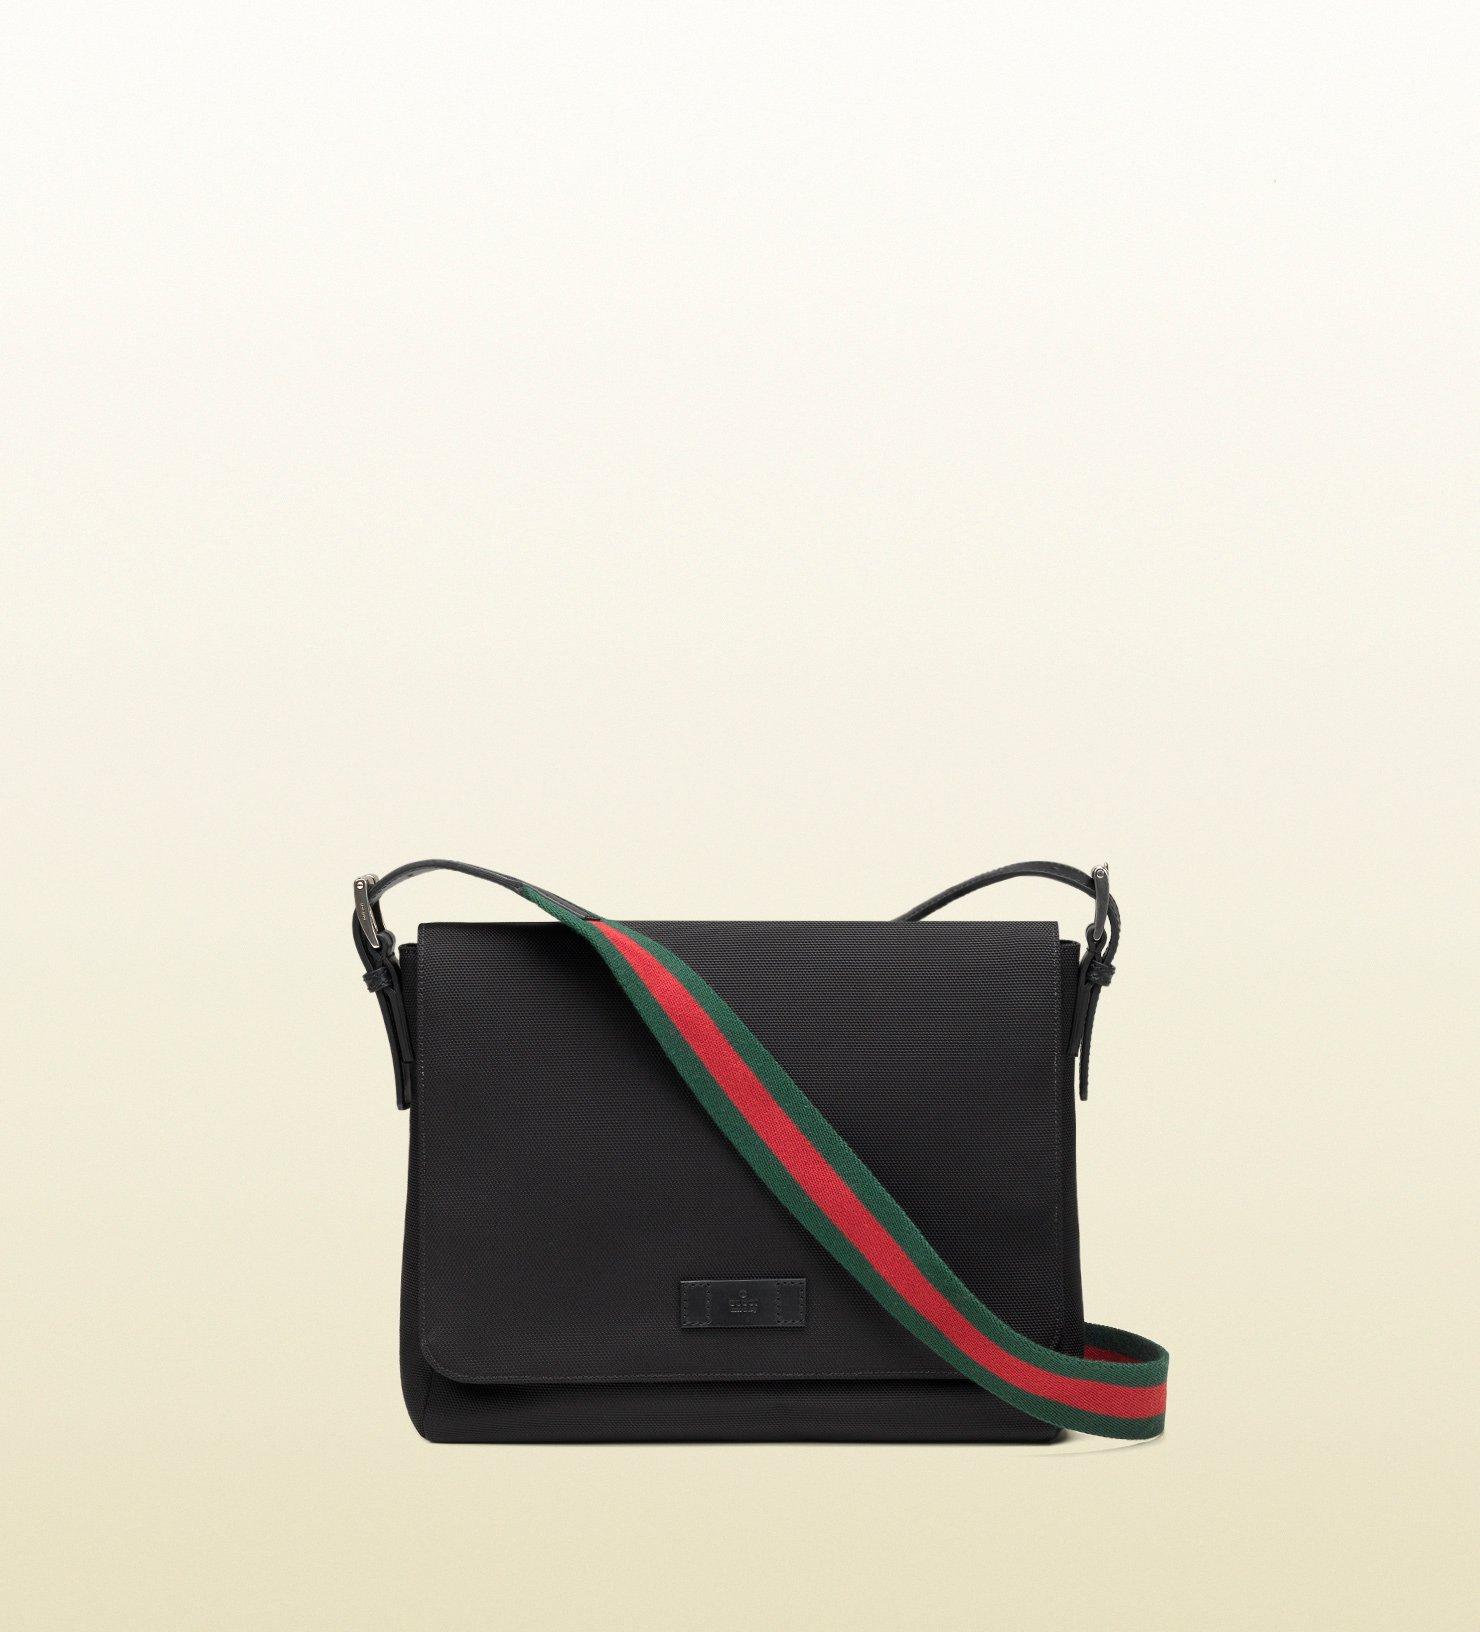 Gucci Black Techno Canvas Messenger Bag in Black for Men | Lyst